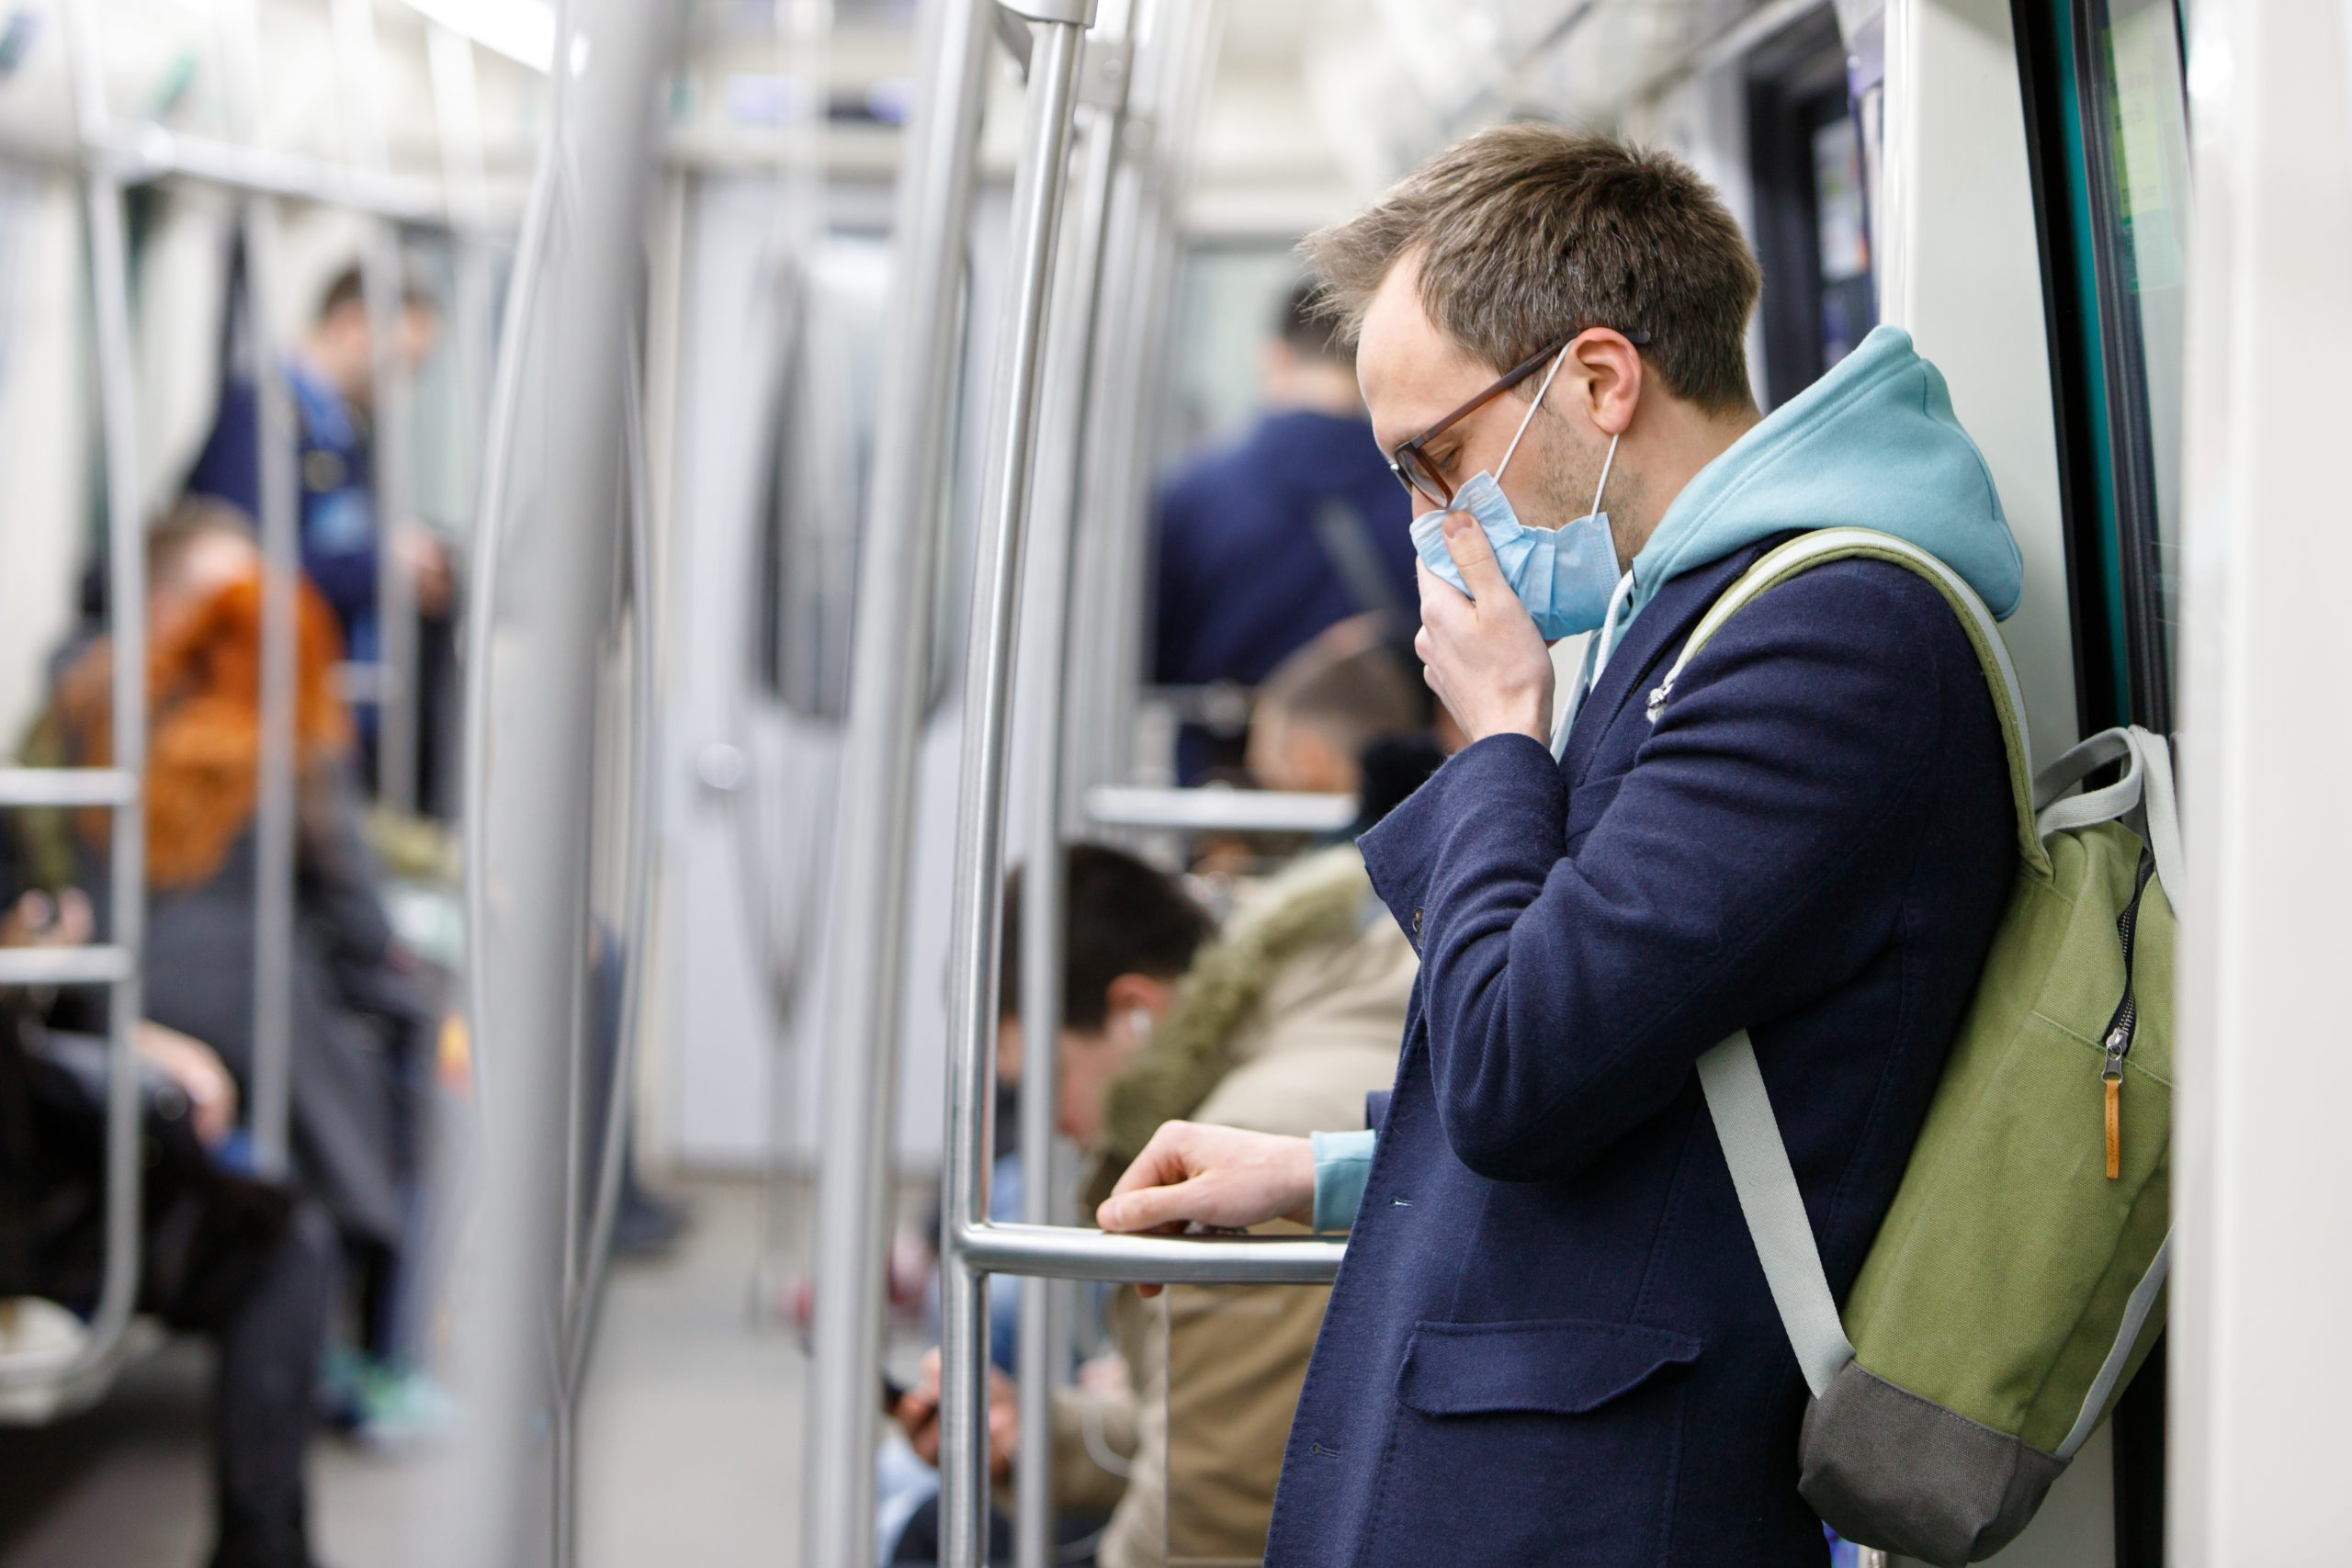 Coronavirus Outbreak: OSHA Guide to Preventing Exposure